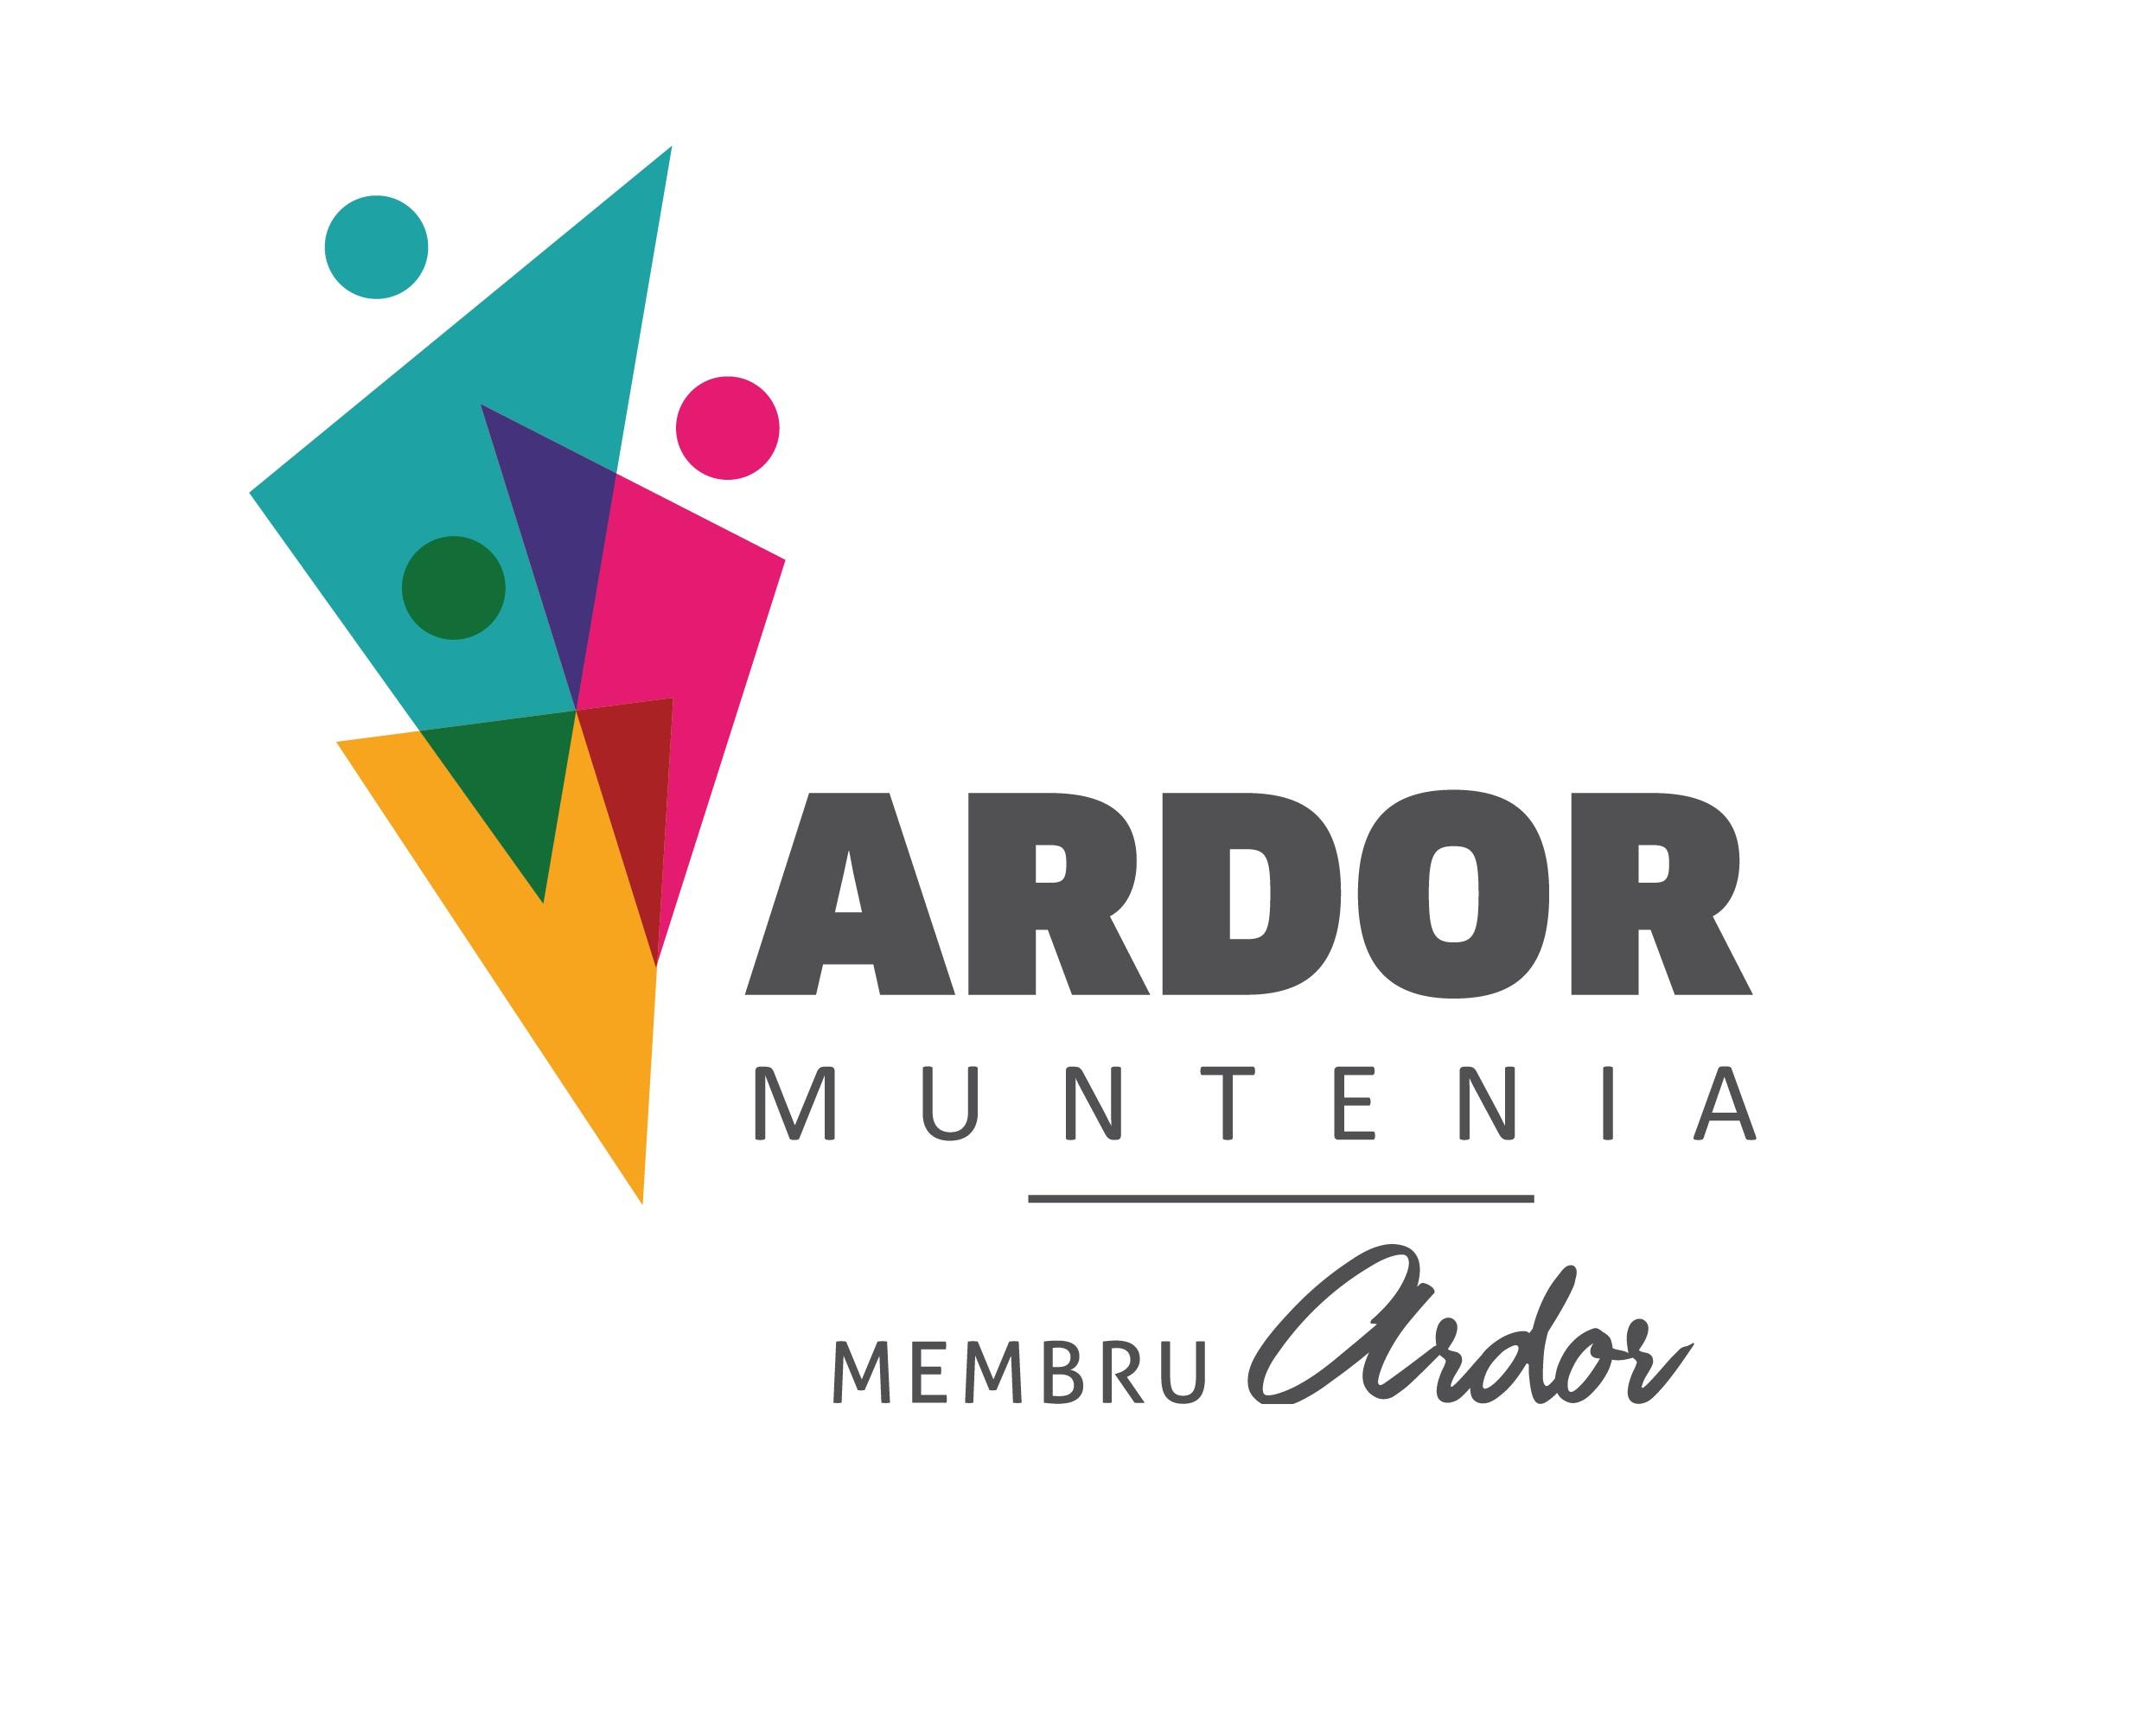 ARDOR Muntenia logo